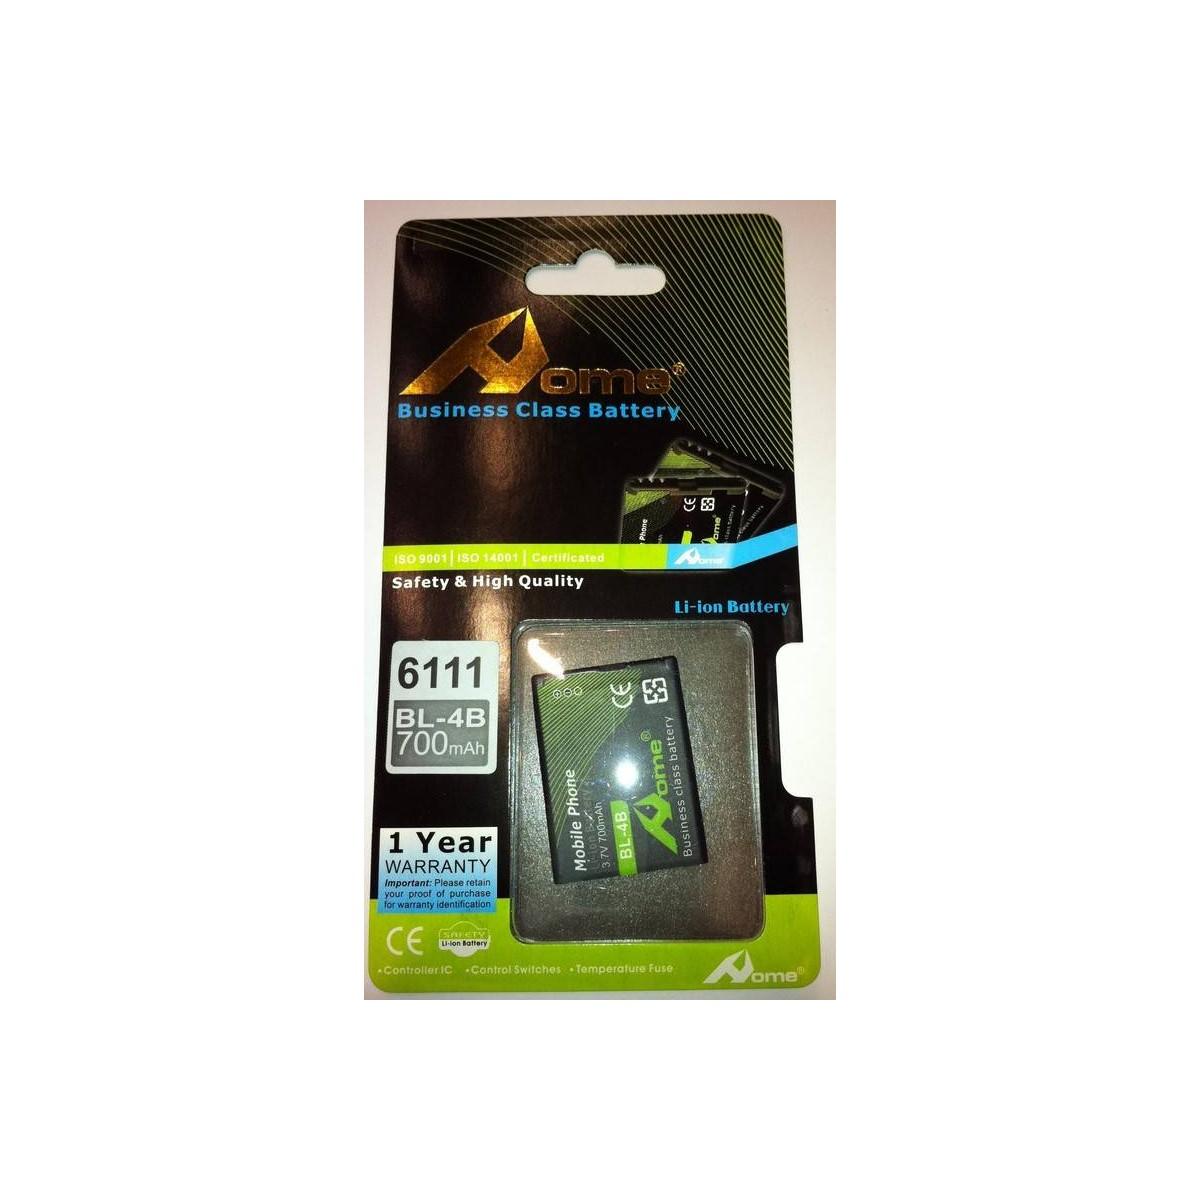 bateria para Nokia BL-4B 2630, 2660, 2760, 5000, 6111. 700M/AH DE LARGA DURACIÒN